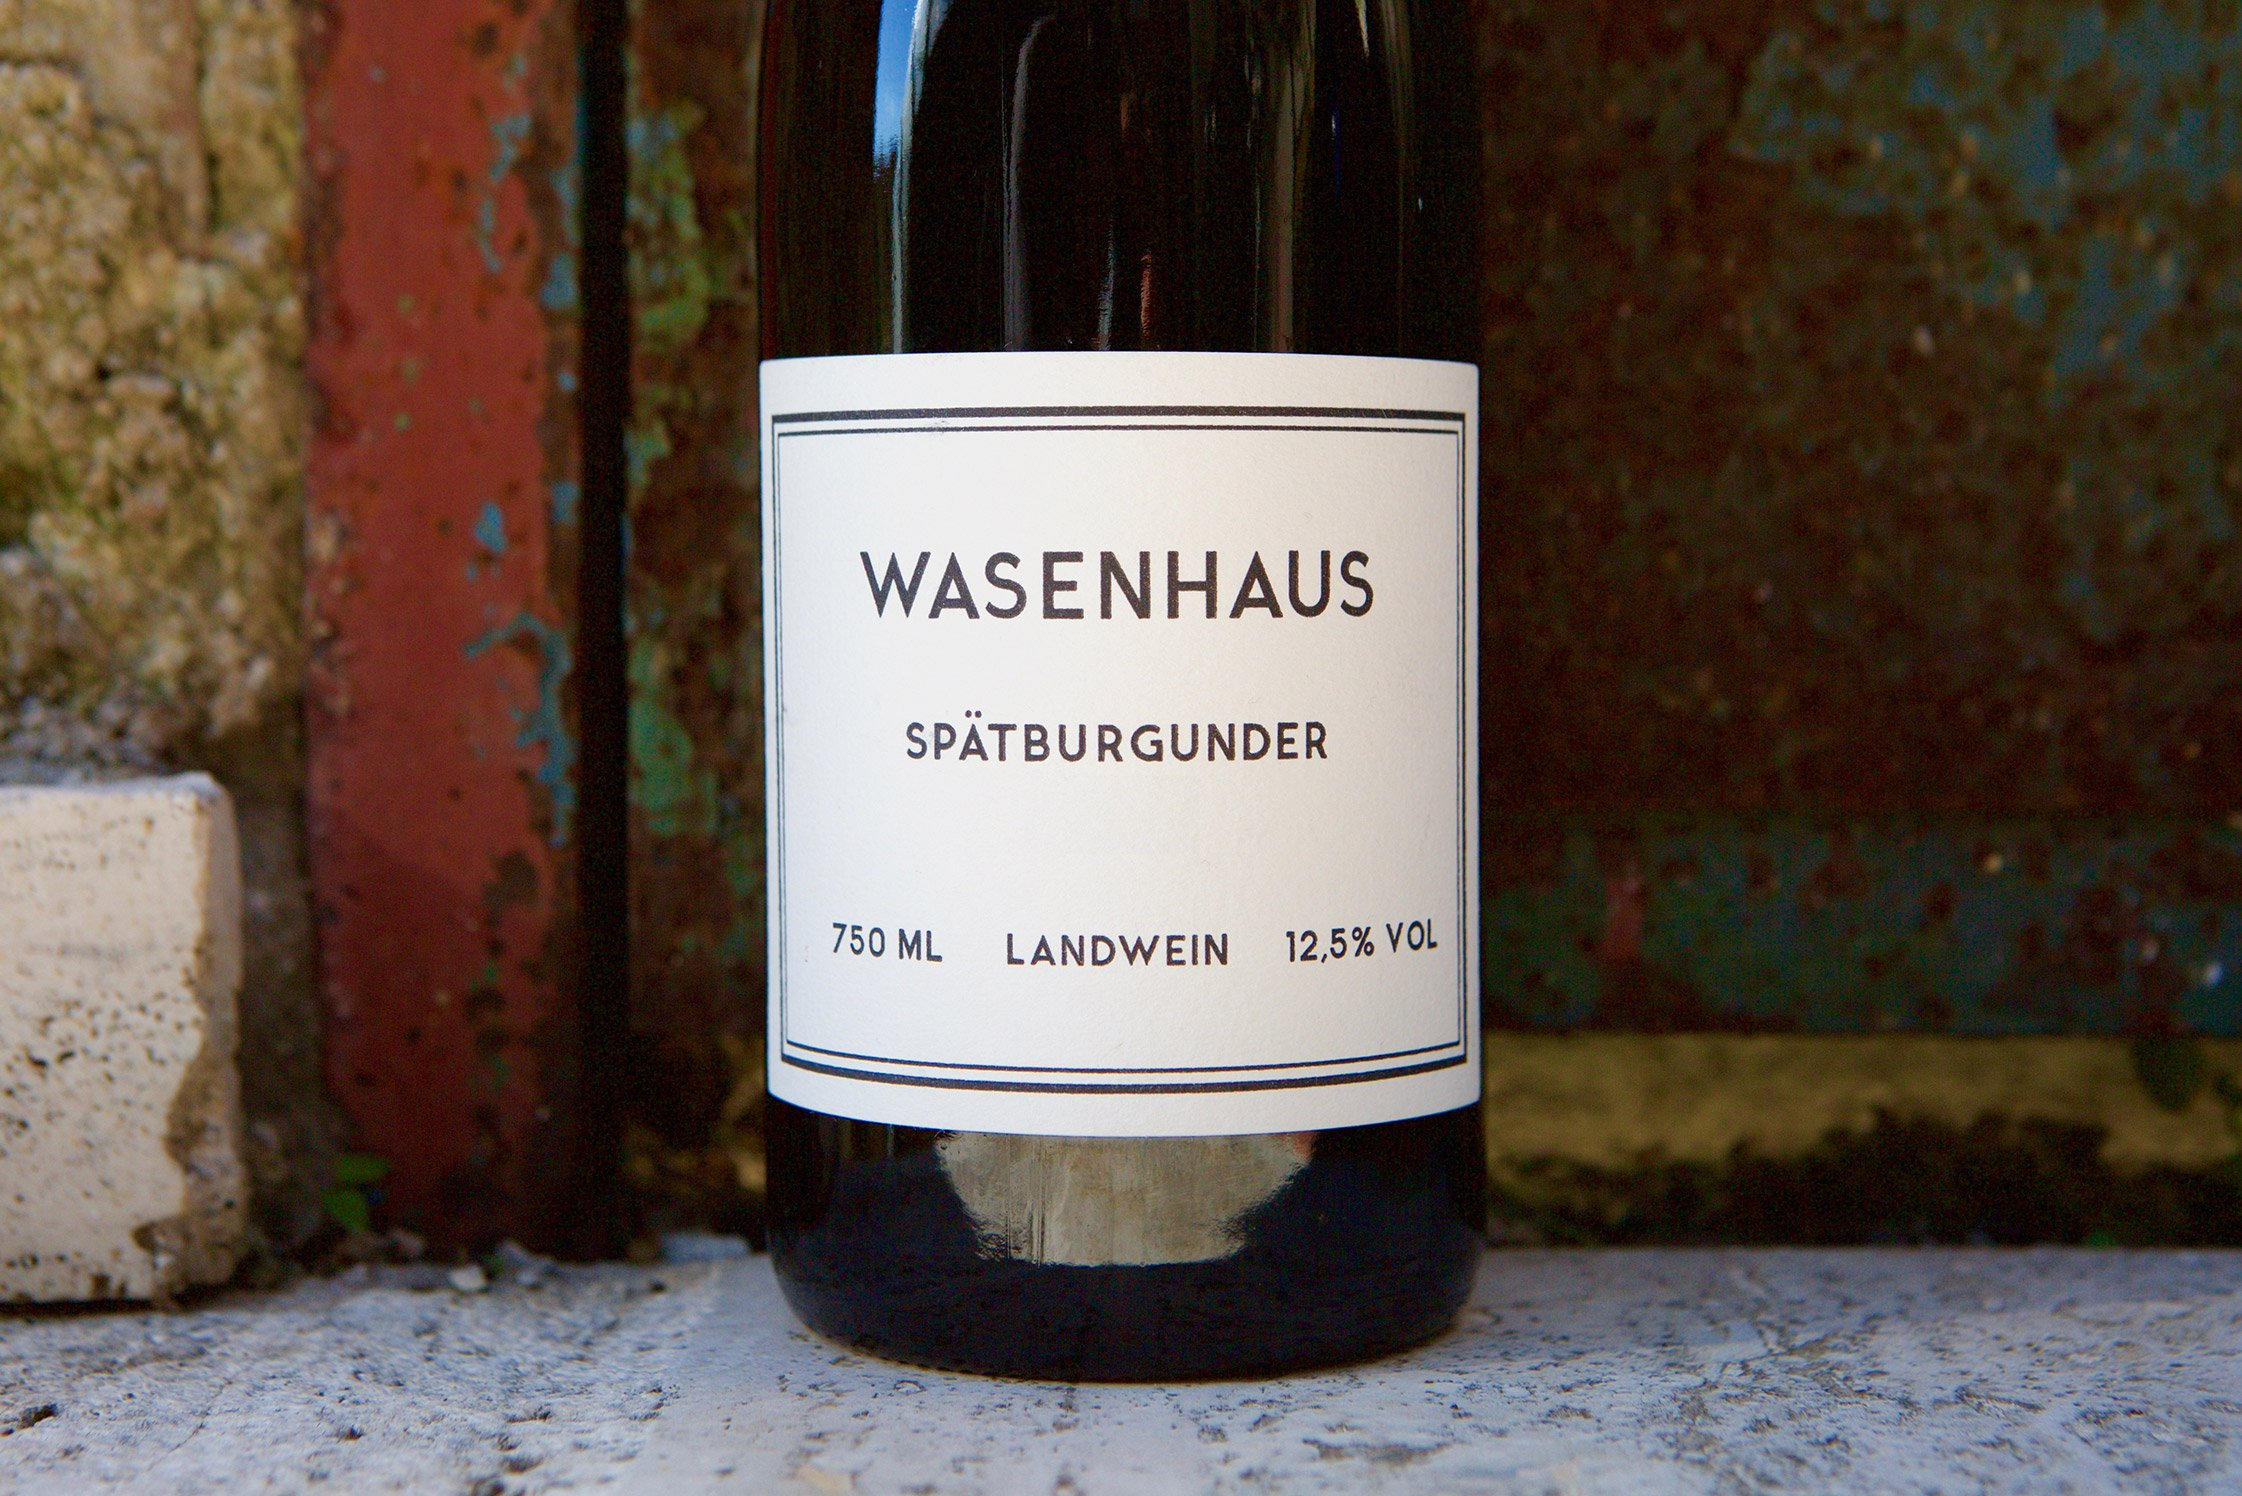 Wasenhaus Spatburgunder